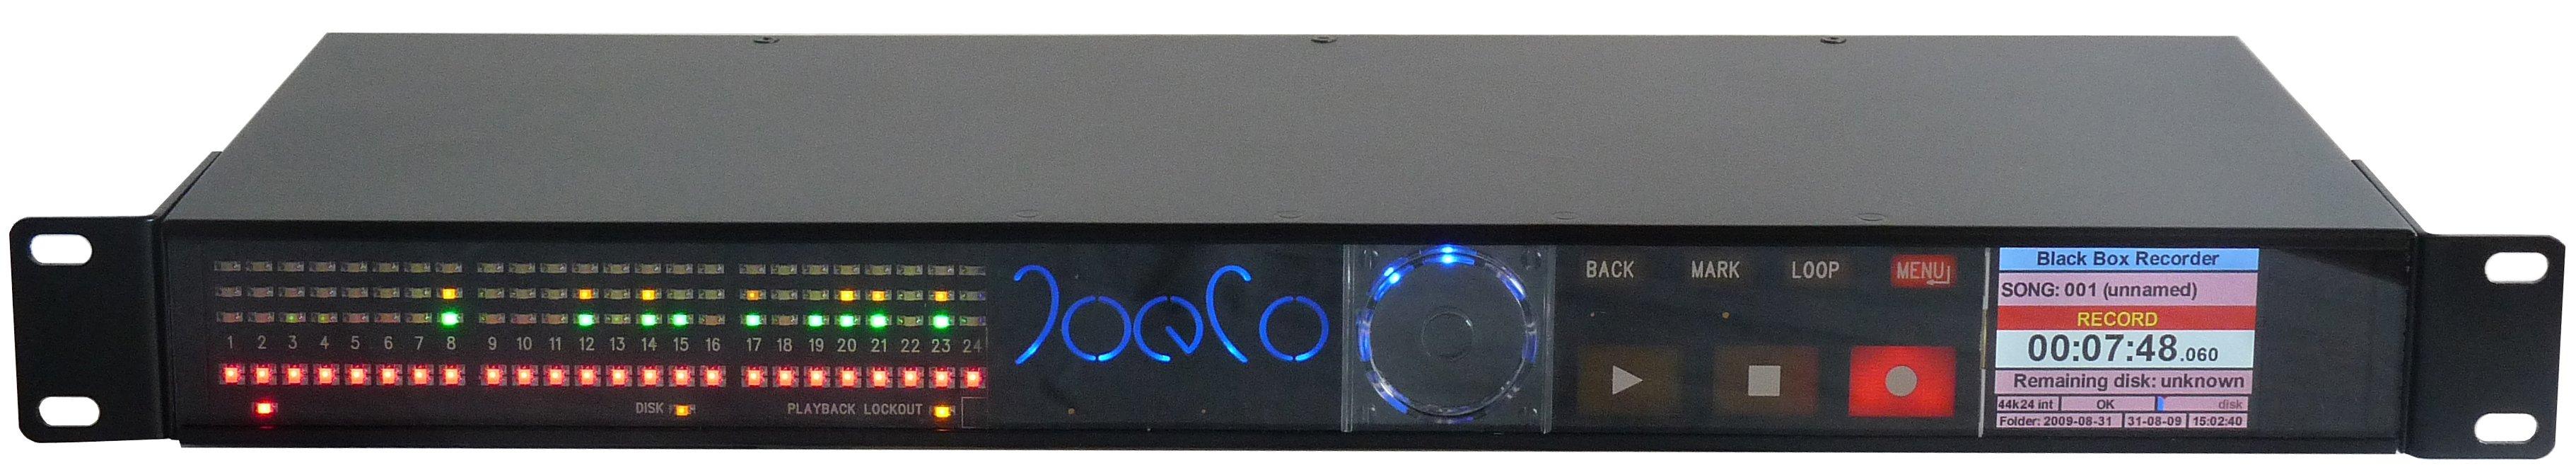 "ADAT, Analog I/O 24 Track ""Blackbox Recorder"" (for Live Performance Recording)"